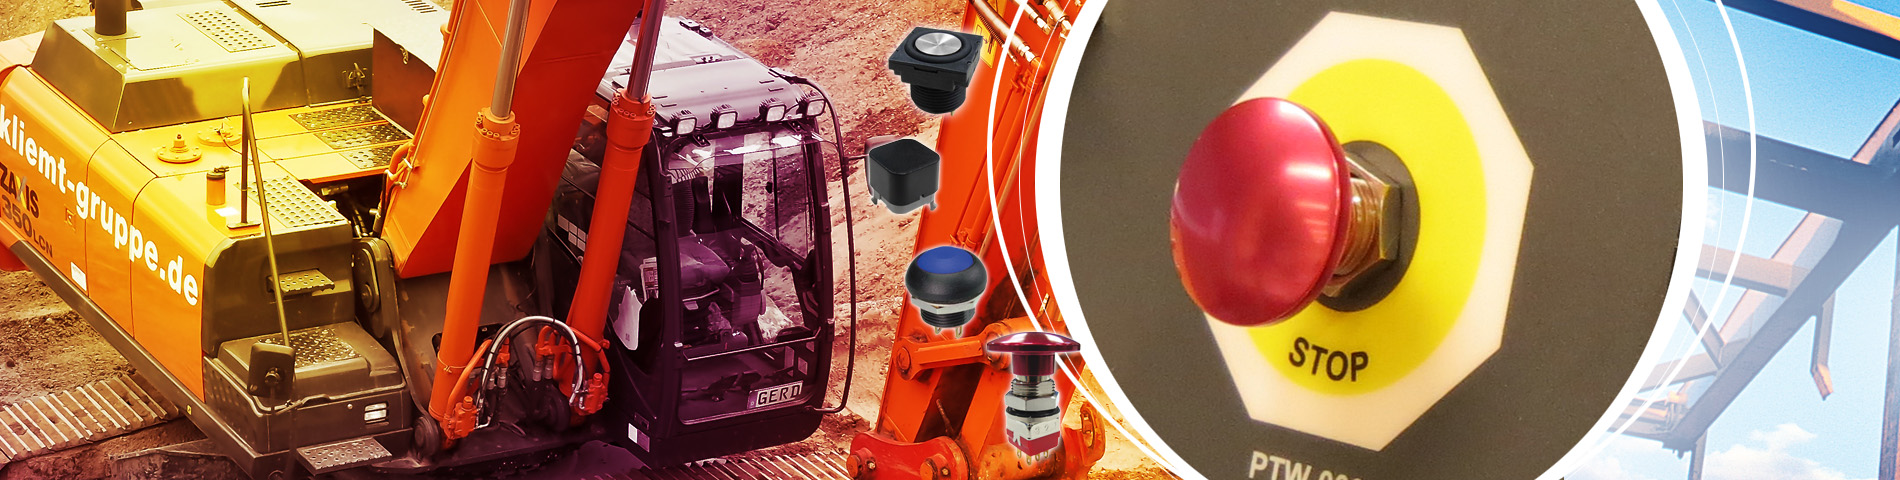 Industria industriale - Applicabile a macchine di grandi dimensioni